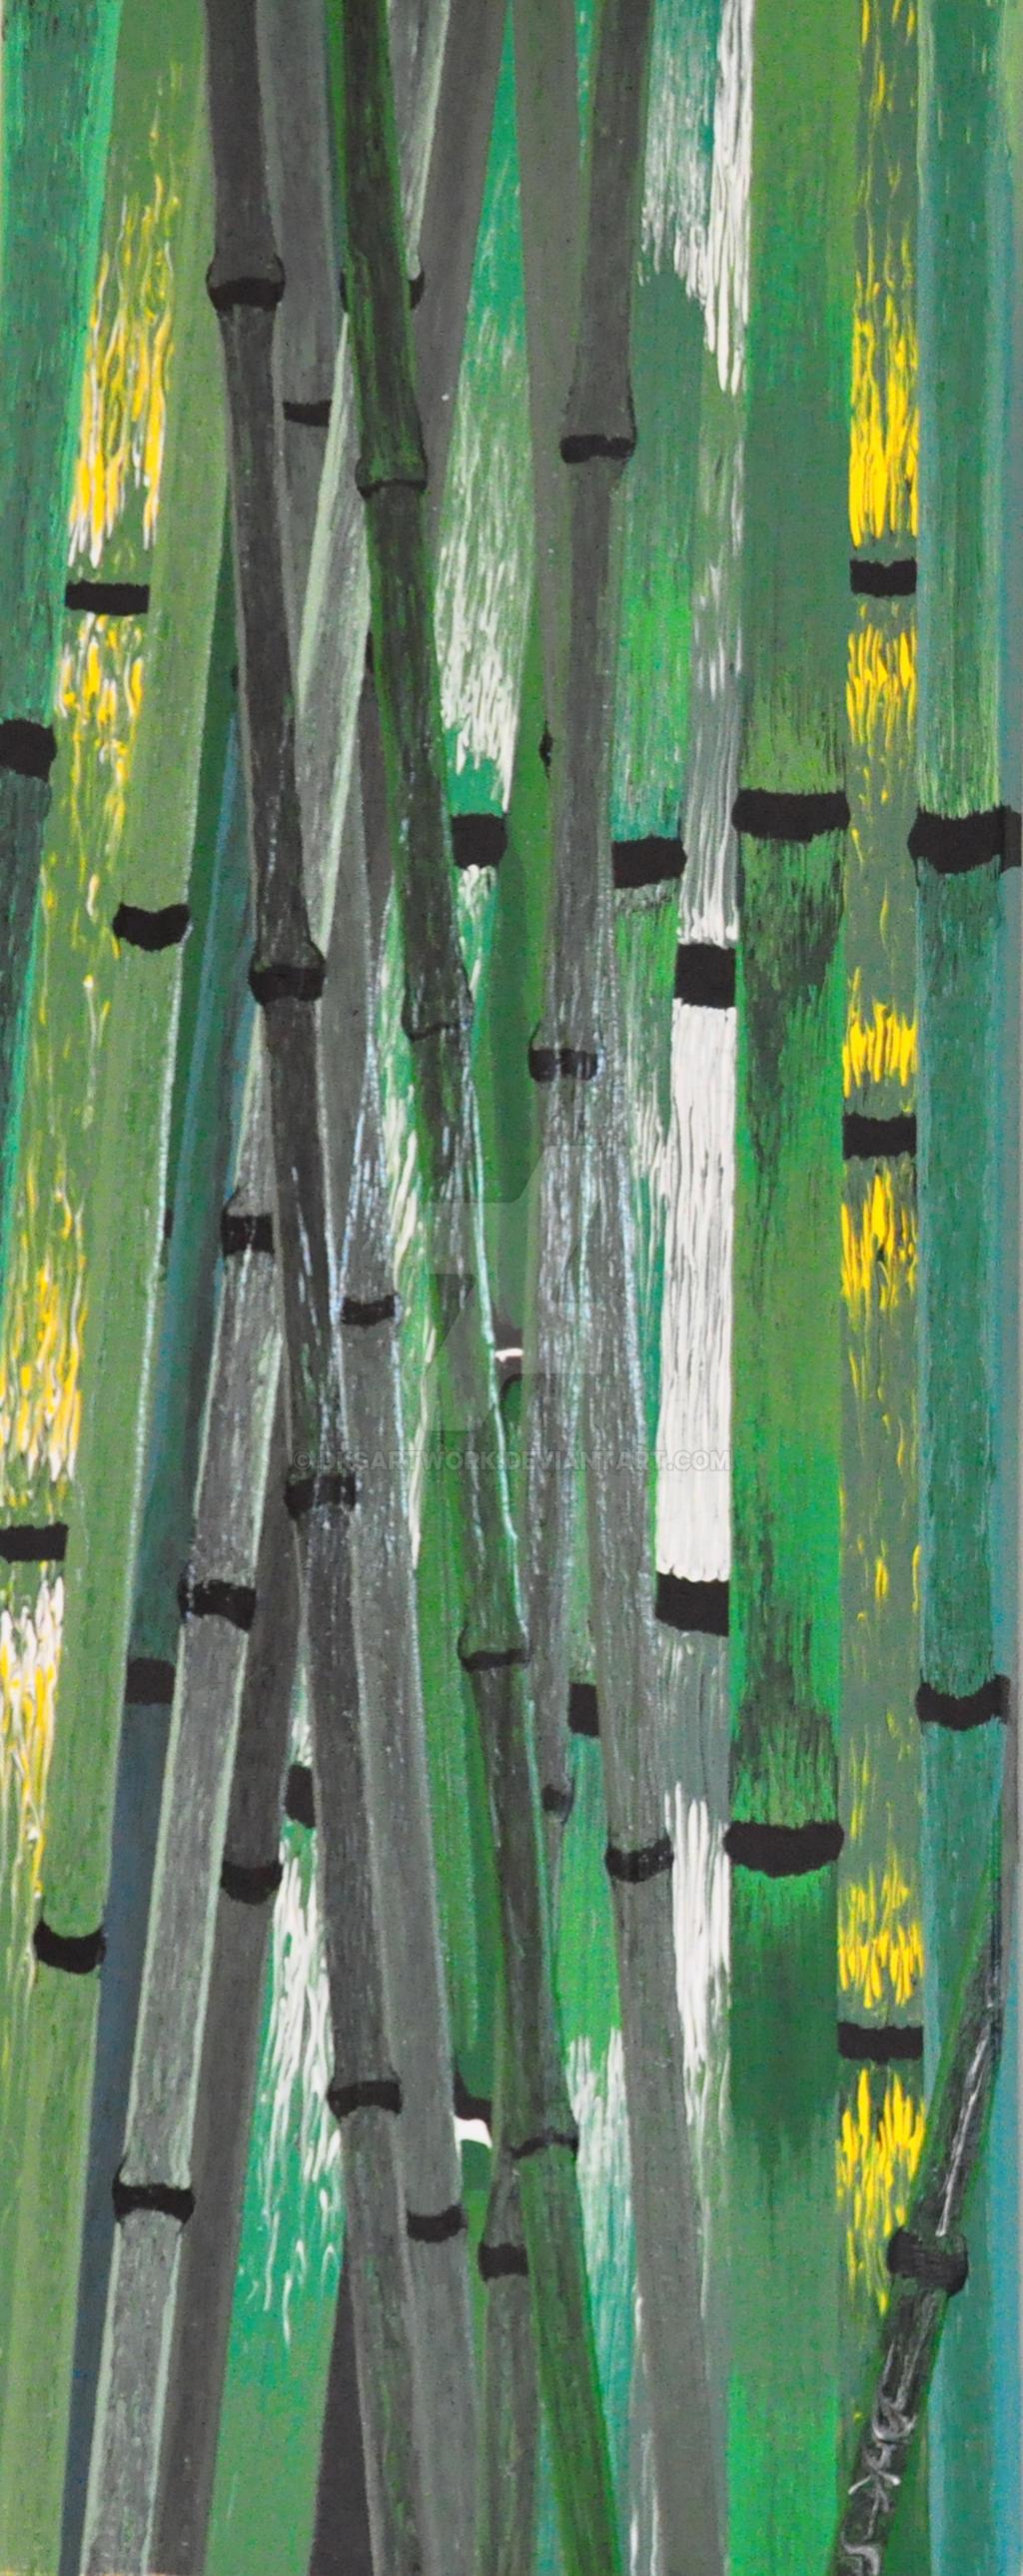 Bamboos 2 by dksartwork